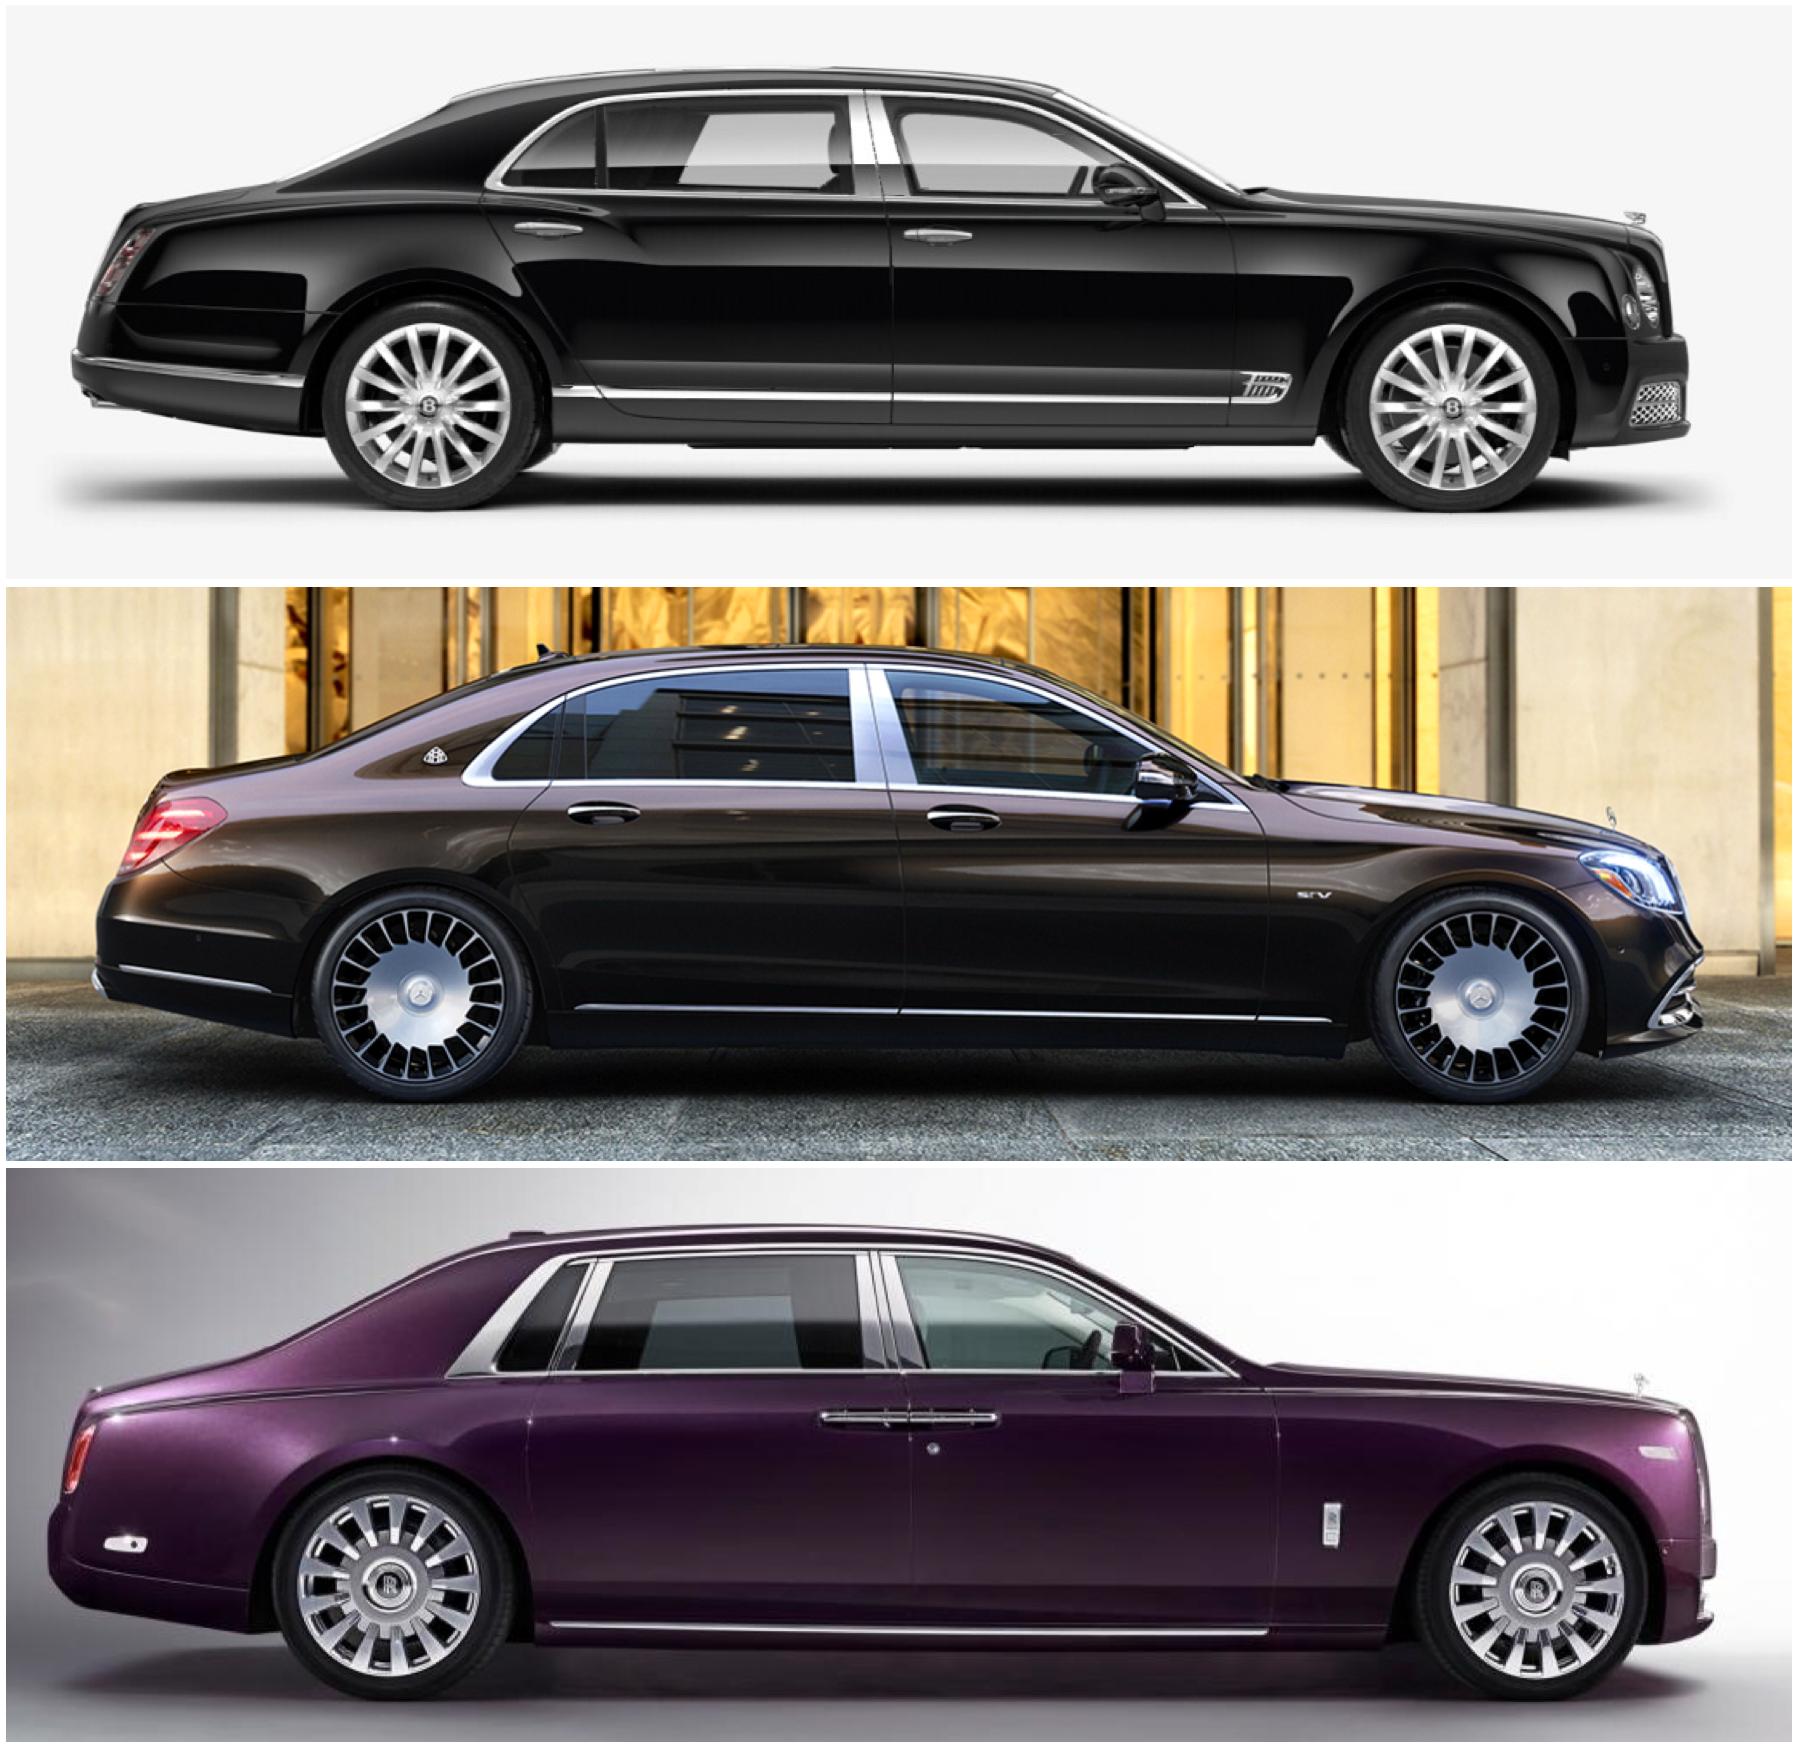 Choose Top: Bentley Mulsanne LWB Middle: Mercedes Maybach